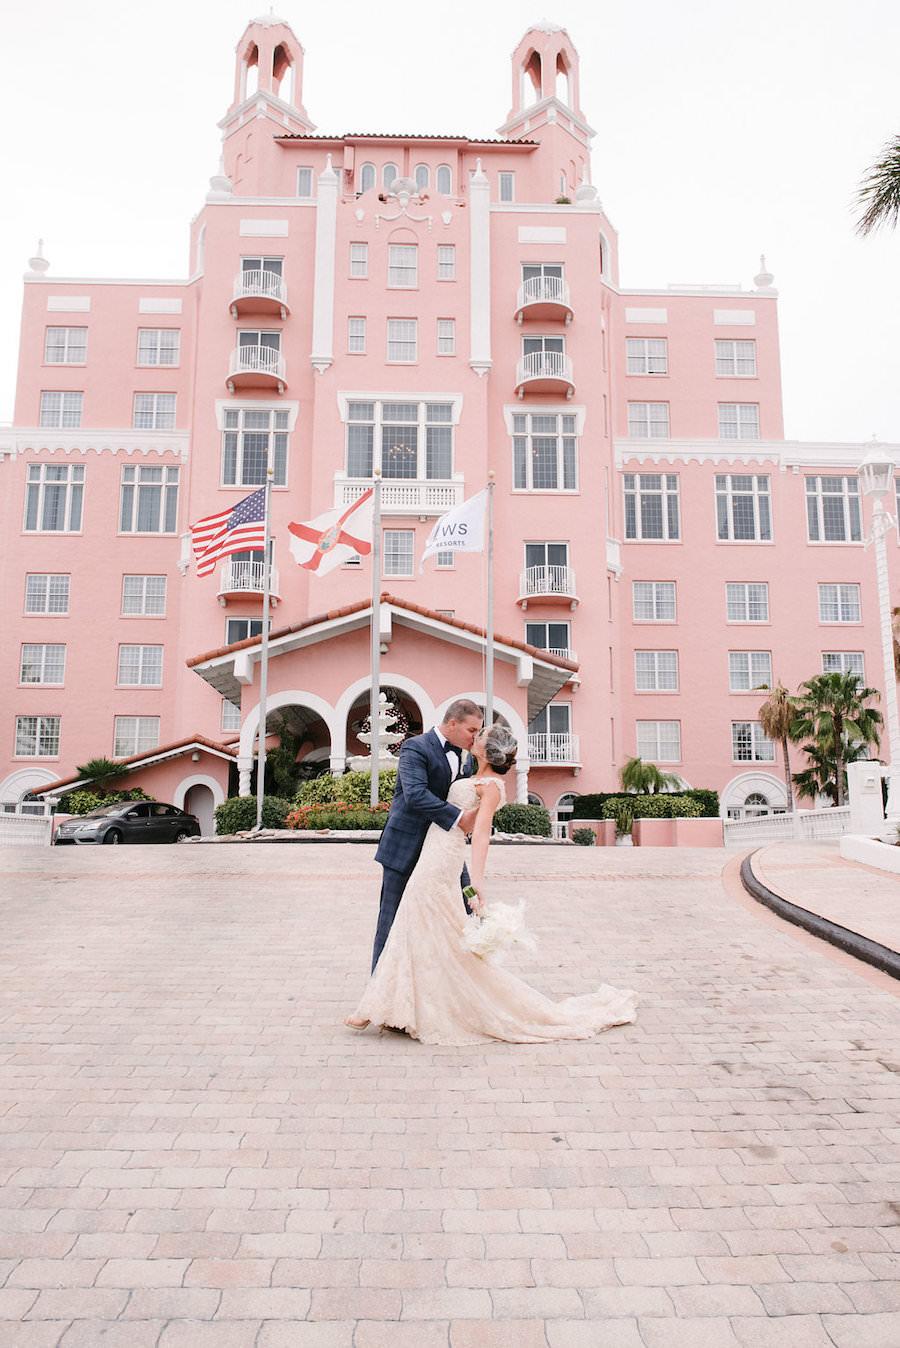 Bride and Groom Wedding Portrait   St. Petersburg Wedding Venue The Don CeSar   Tampa Bay Wedding Photographer Jonathan Fanning Studio and Gallery